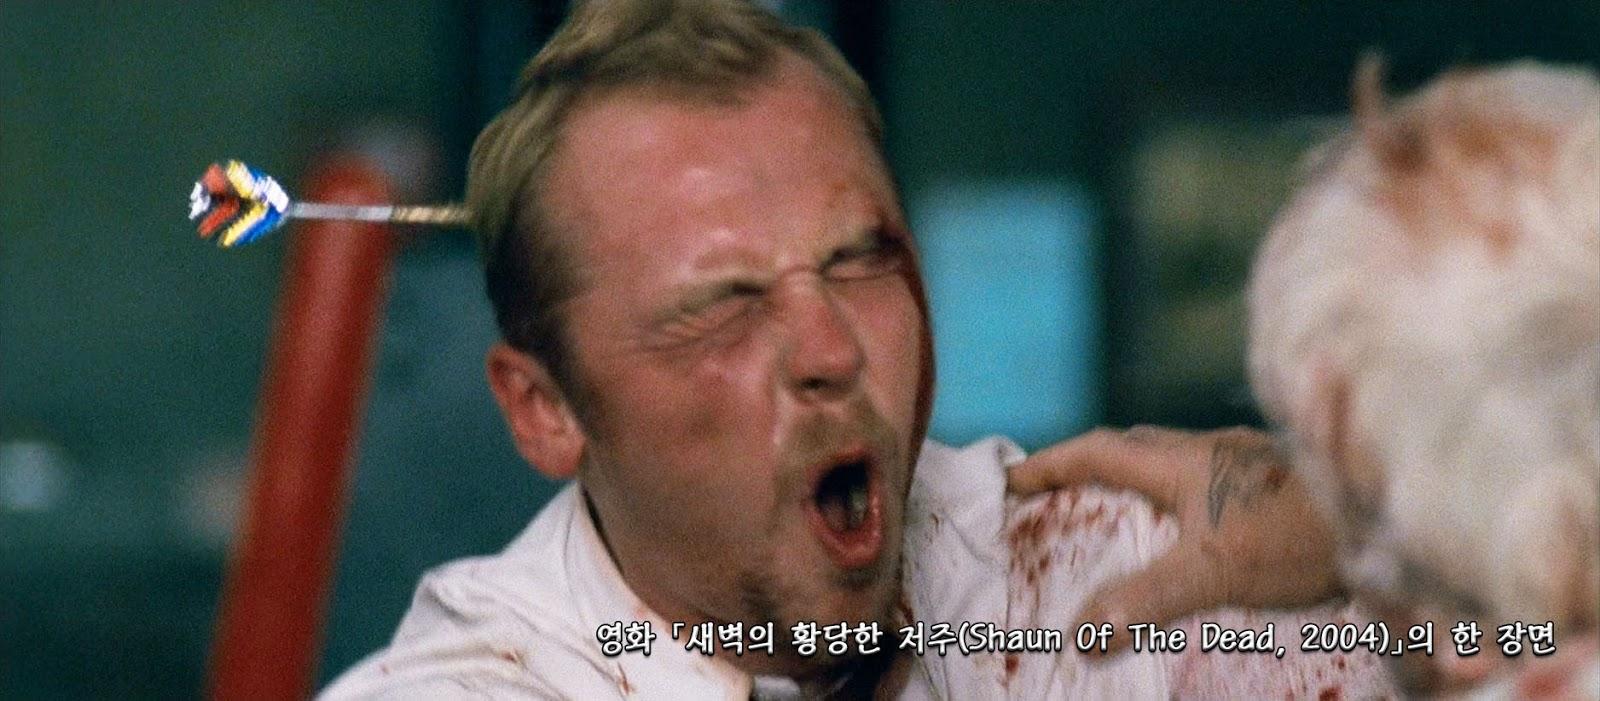 Shaun Of The Dead 2004 scene 03